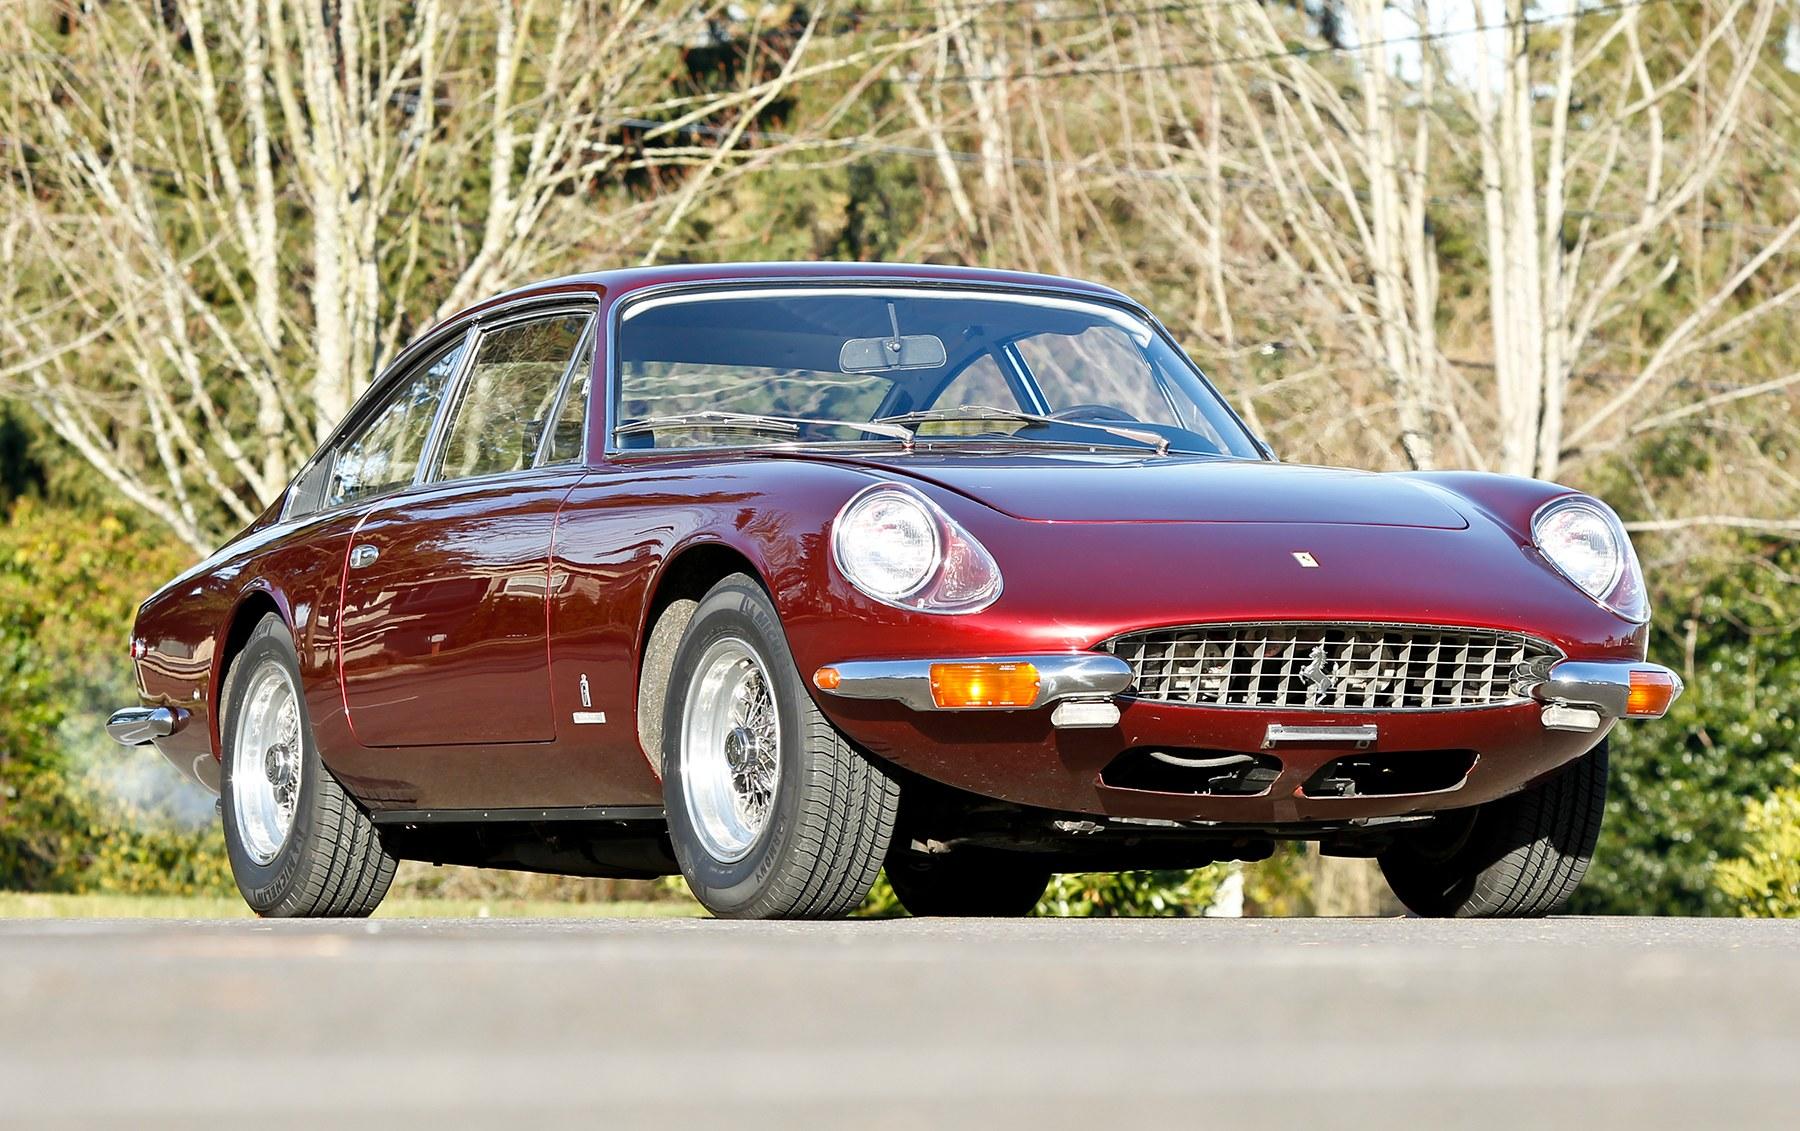 1970 Ferrari 365 GT 2+2 (1)